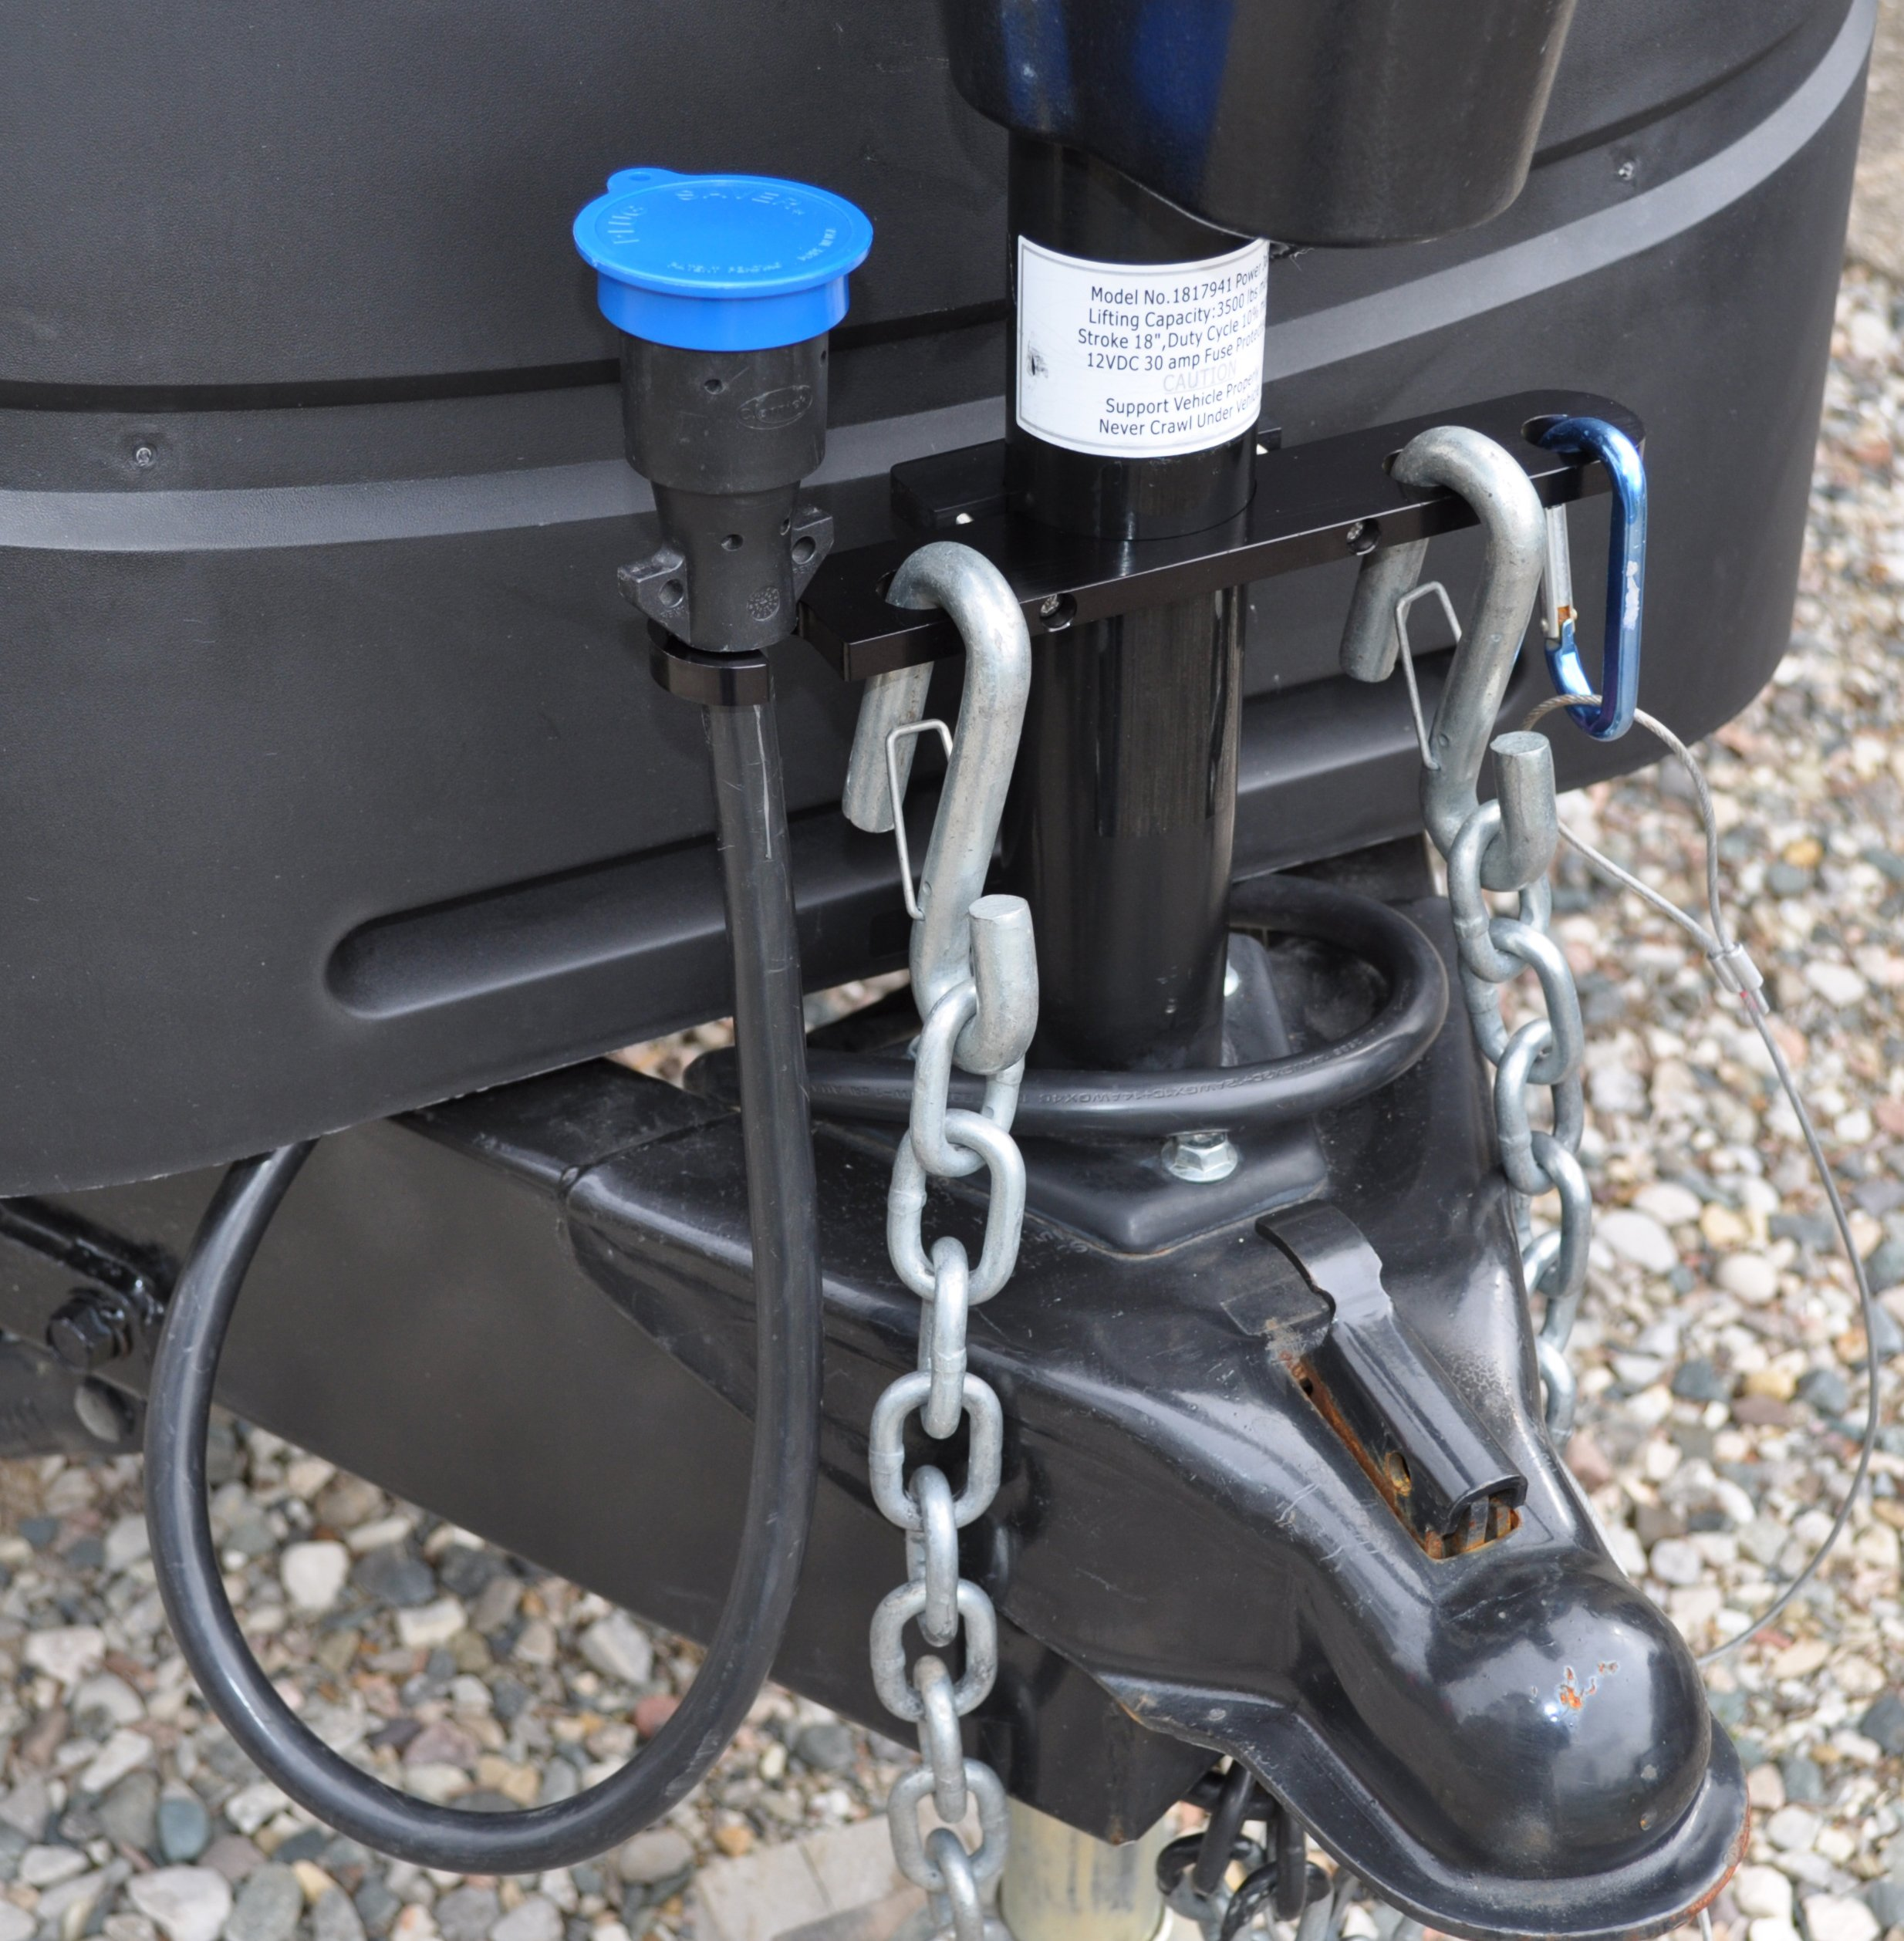 GR innovations llc Tongue Jack Trailer Towing Organizer | Black Aluminum Chain Saver Premium Kit by GR innovations llc